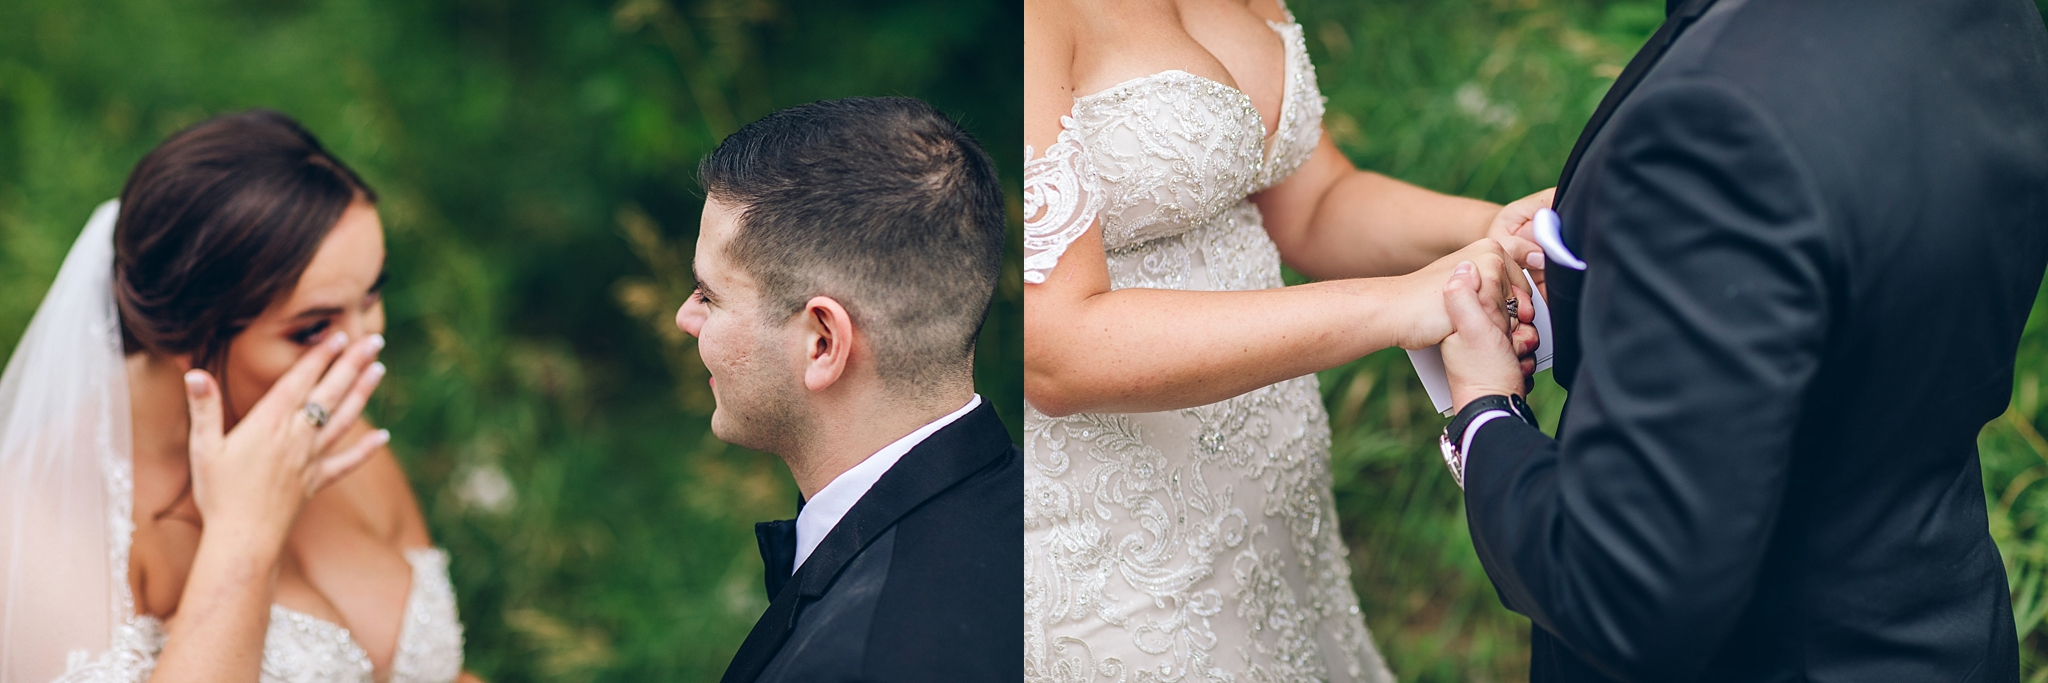 baker-lofts-holland-michigan-wedding-photographer_0336.jpg